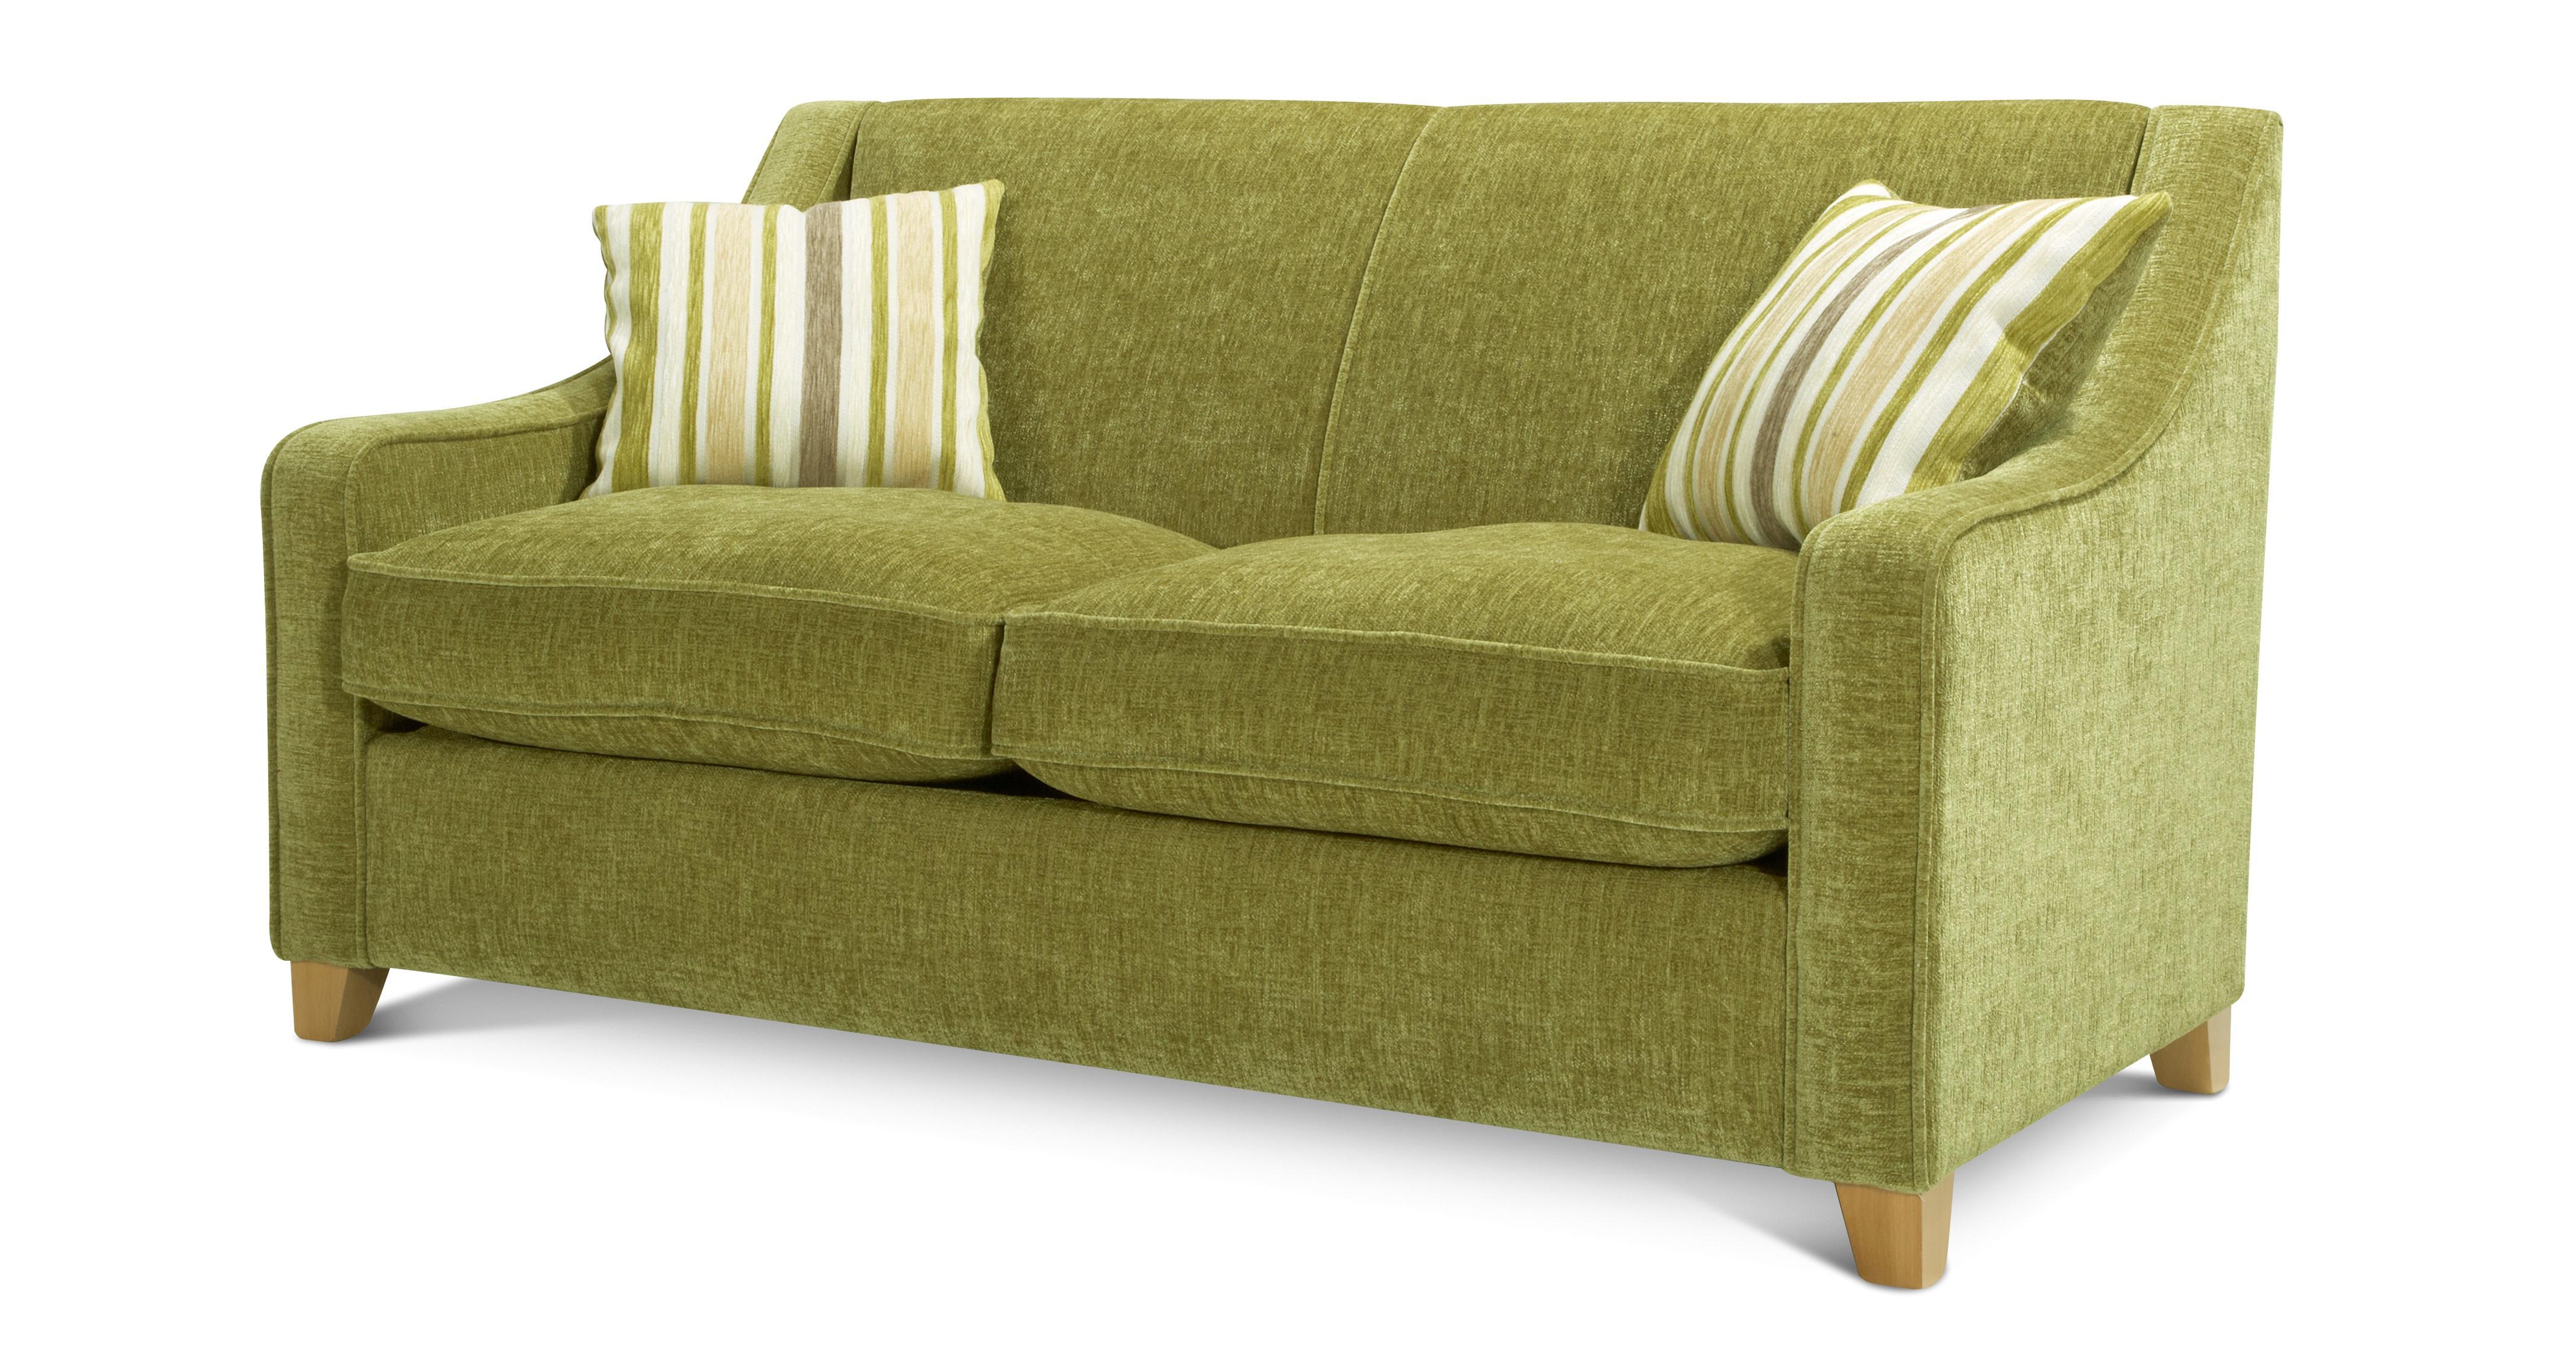 rachel 2 seater compact sofa bed rachel dfs. Black Bedroom Furniture Sets. Home Design Ideas